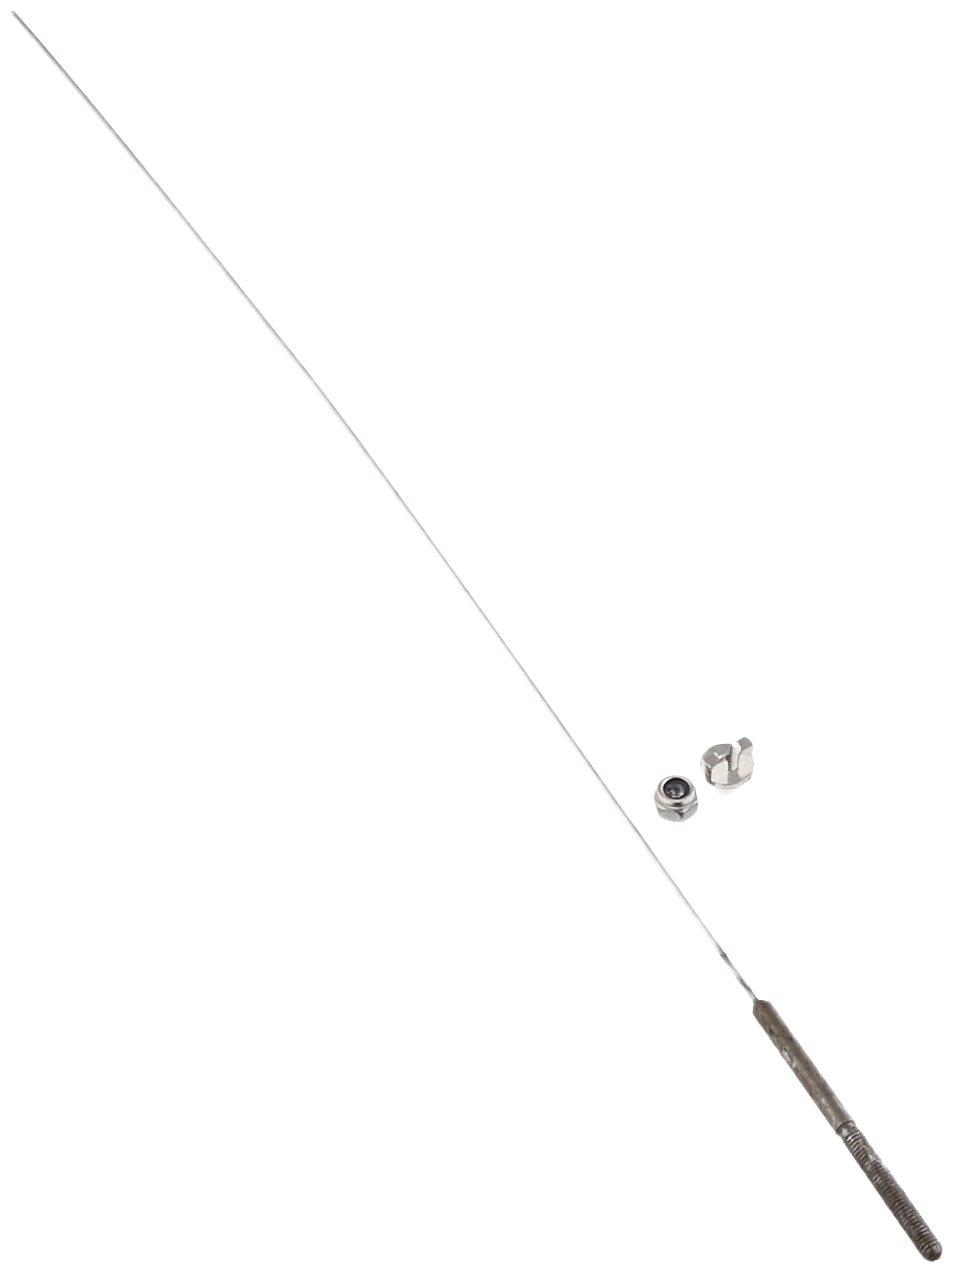 AquaCraft Wire Drive w/Prop Shaft GP-1